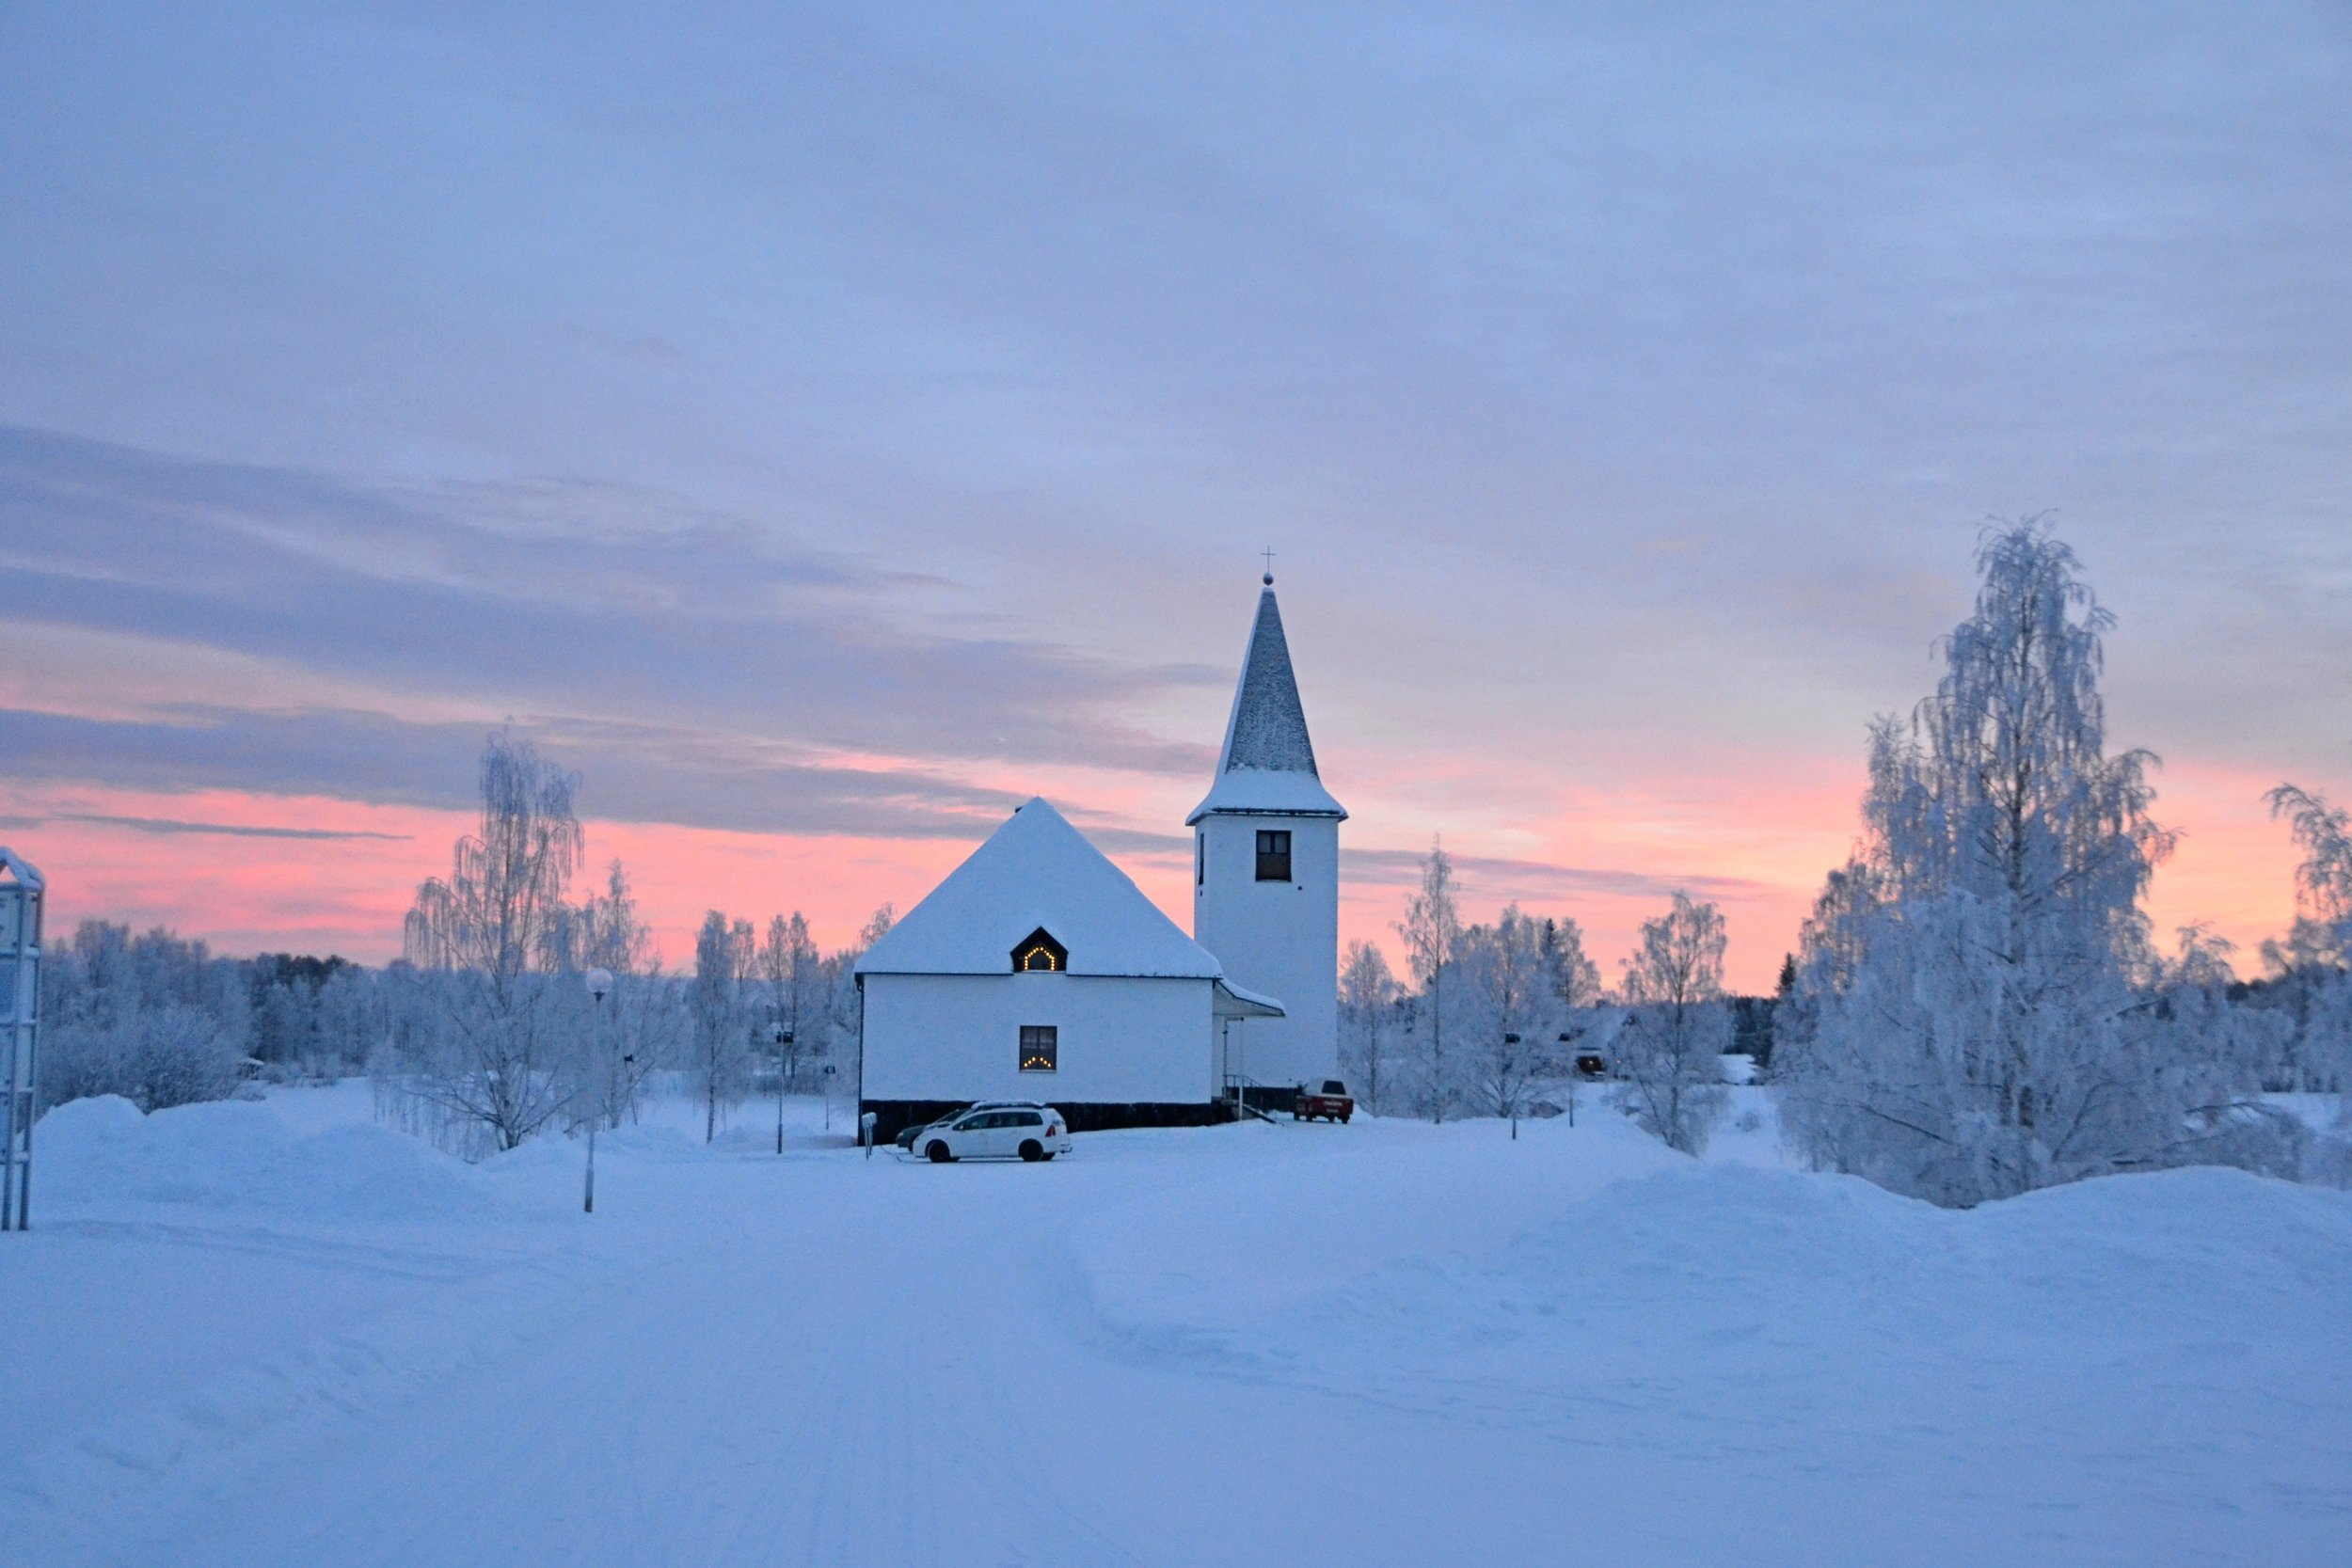 Winter Church Scene